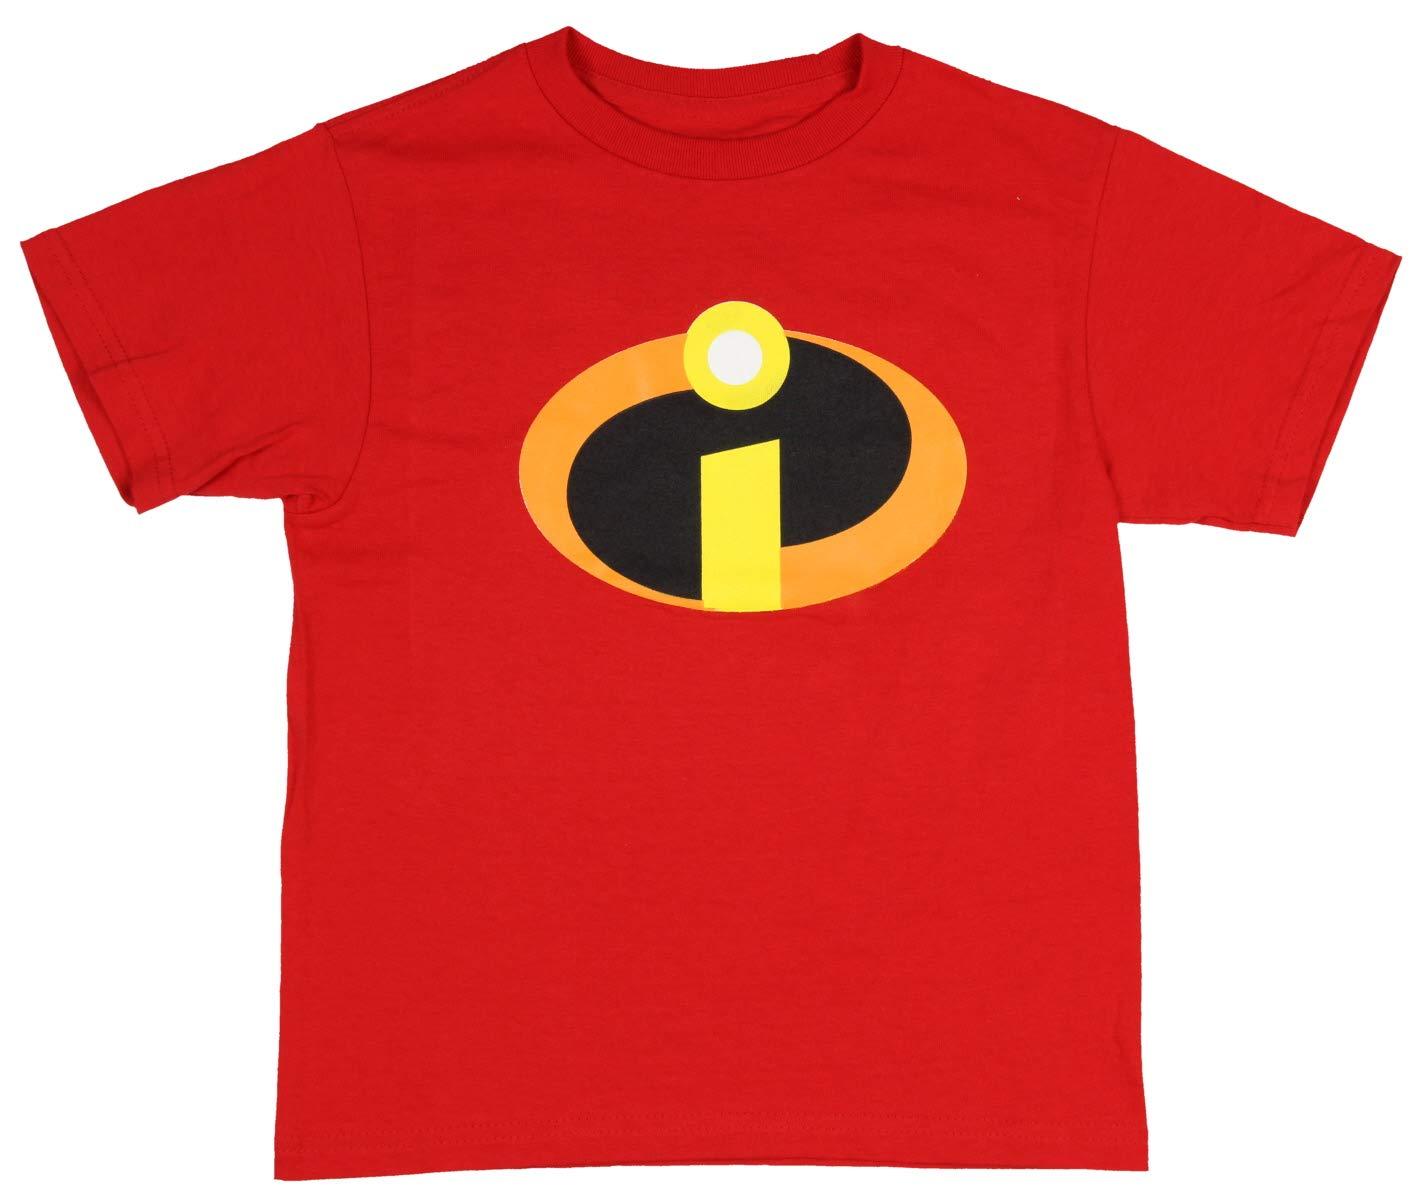 Pixar Incibles 2 Shirt Little Movie Logo Graphic T Shirt 6209